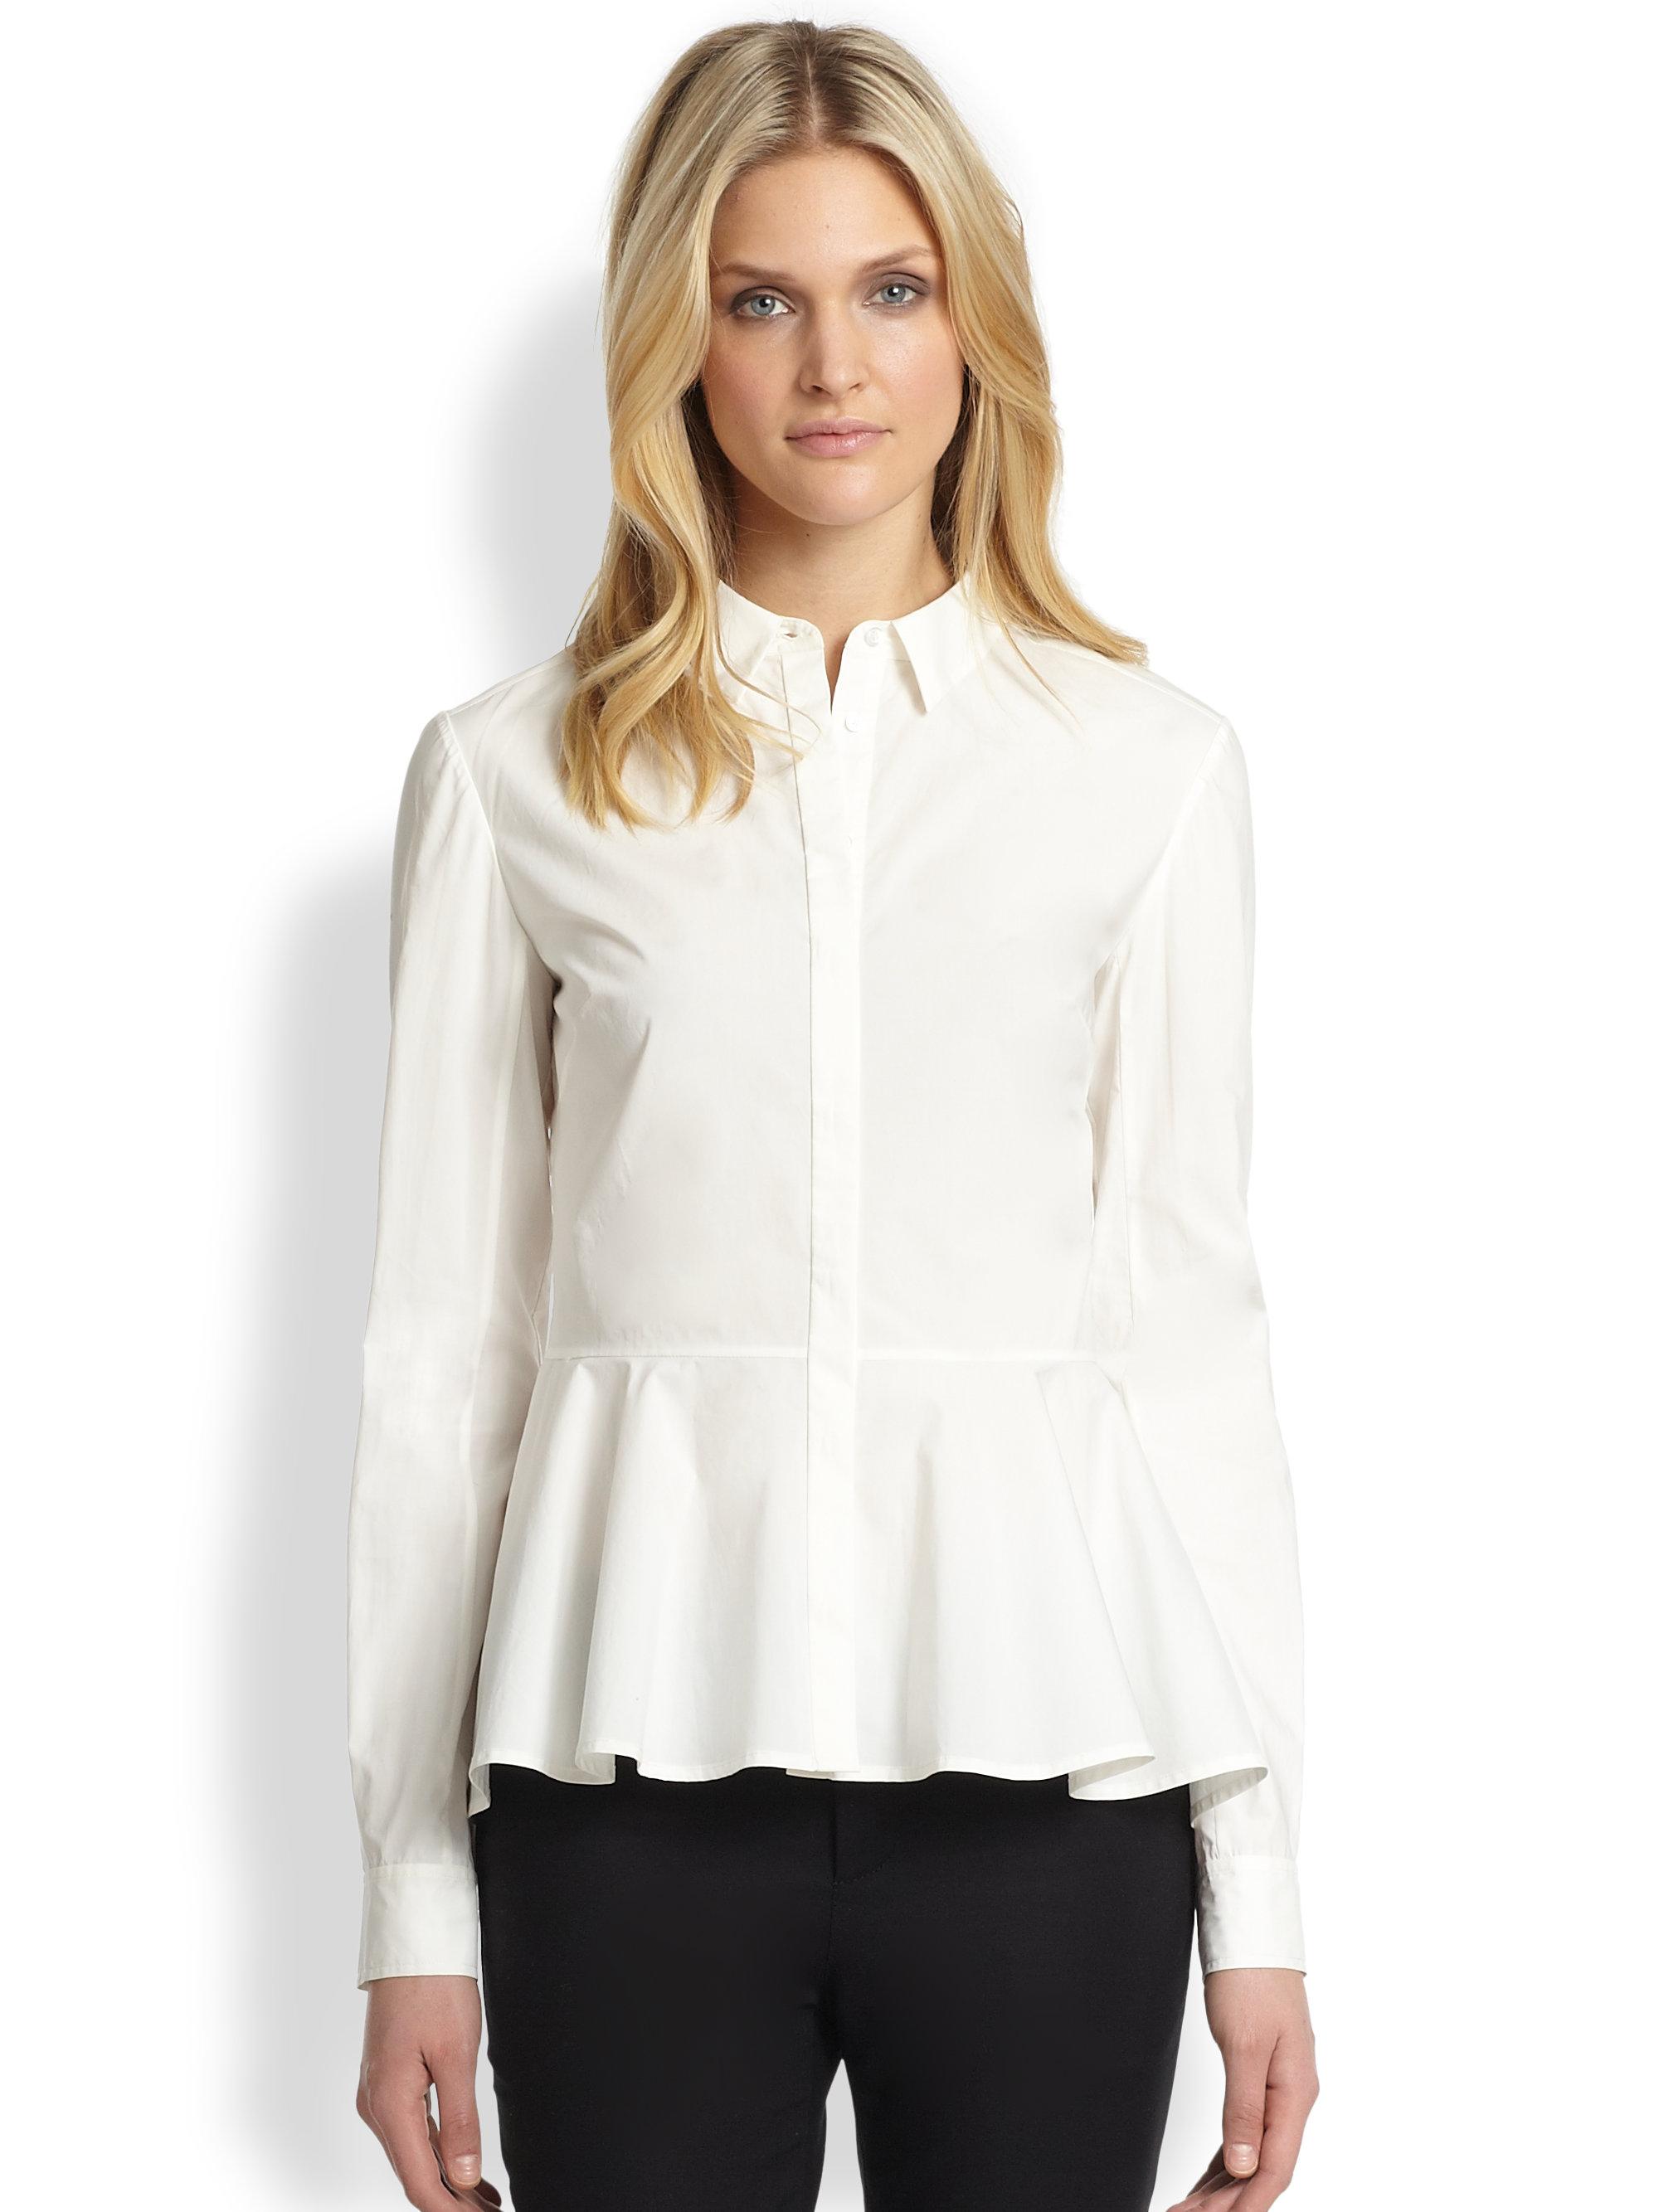 Jean Shirts Women